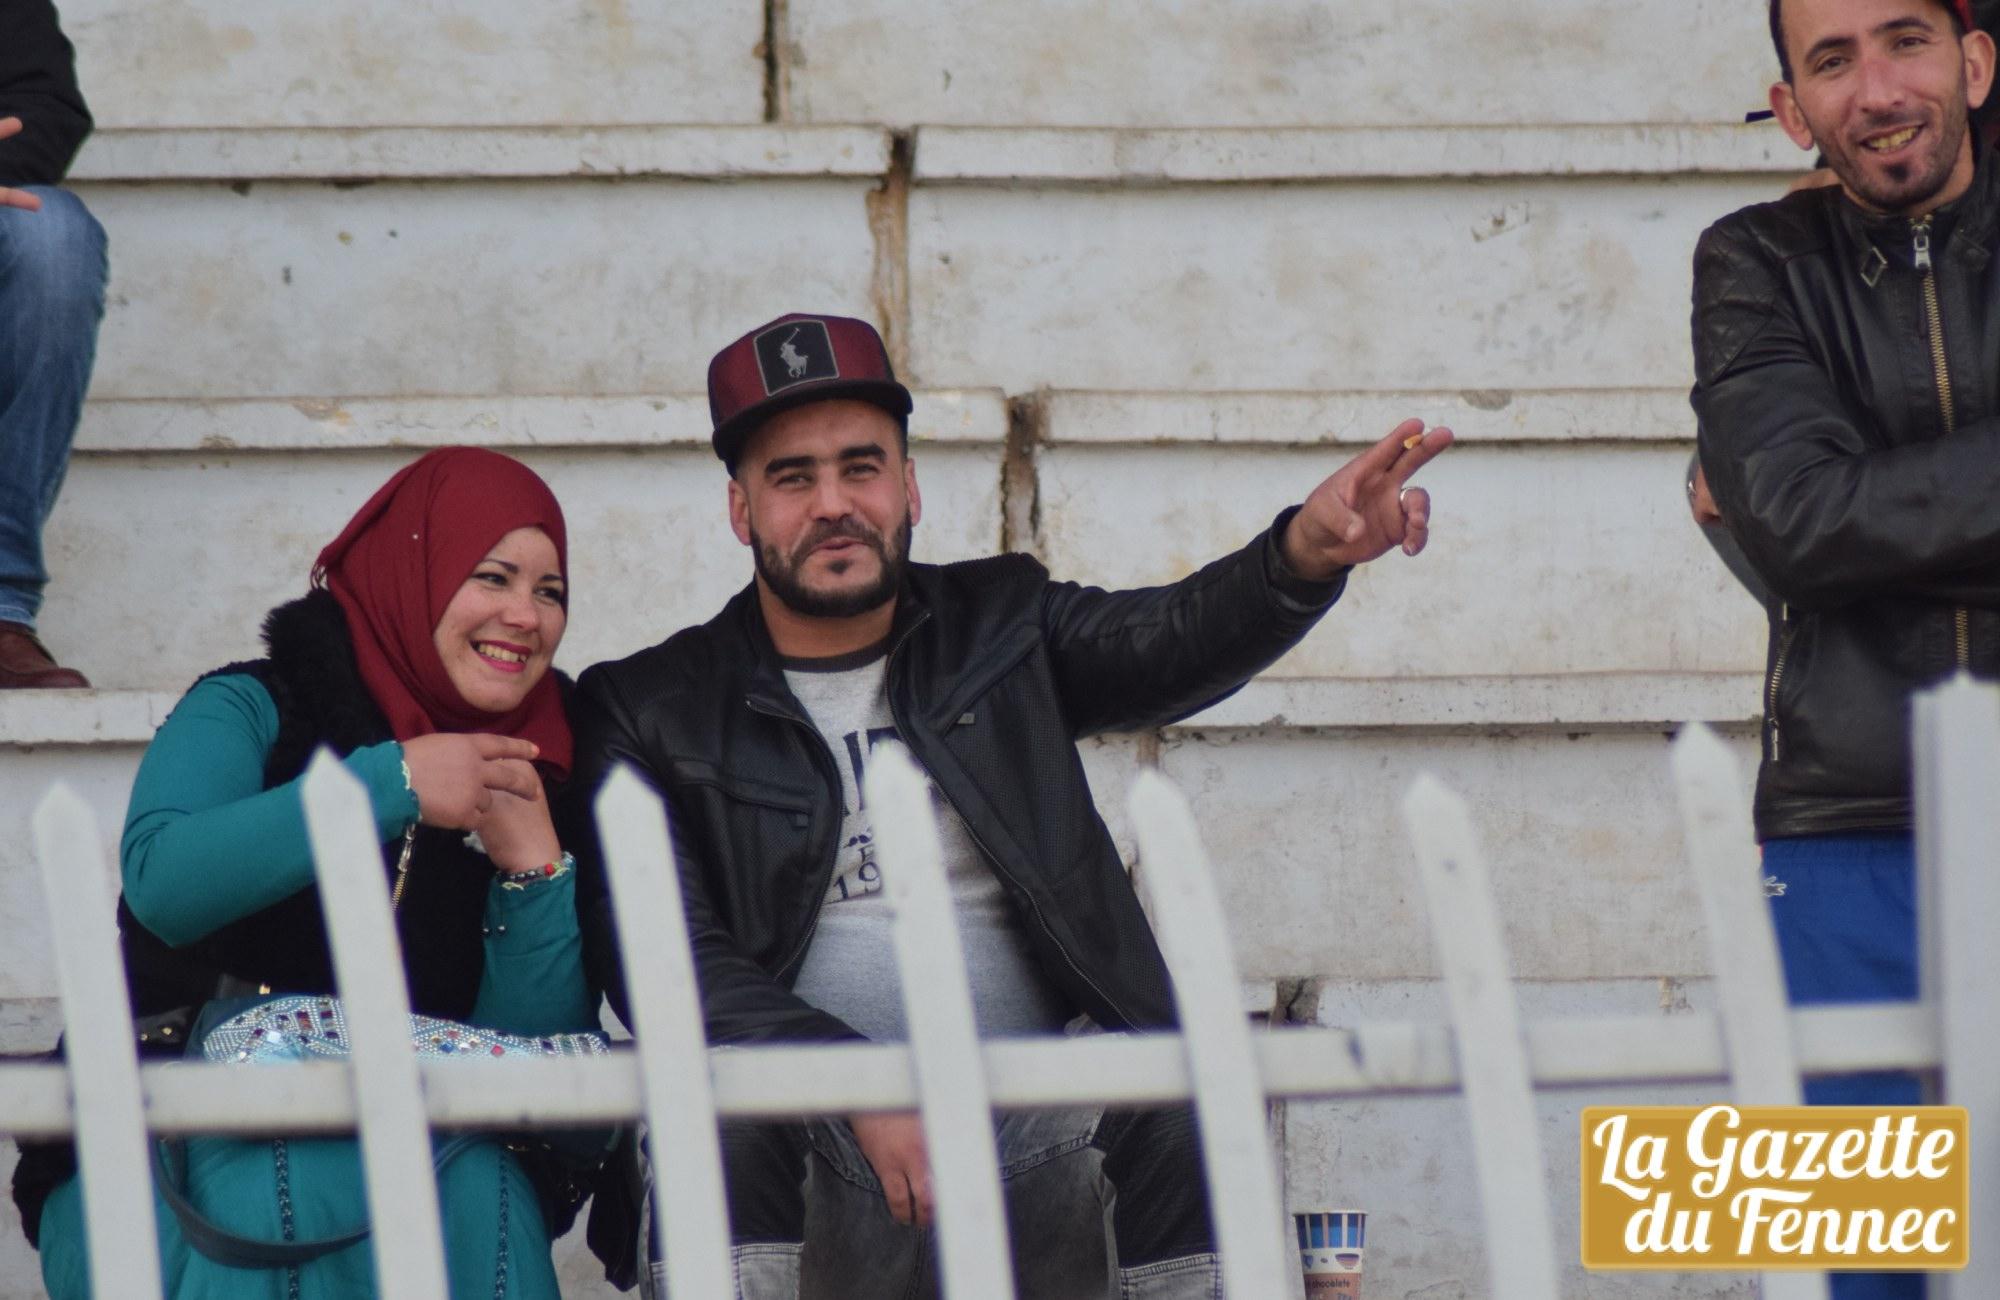 rugby-algerie-maroc-public-couple-zabana